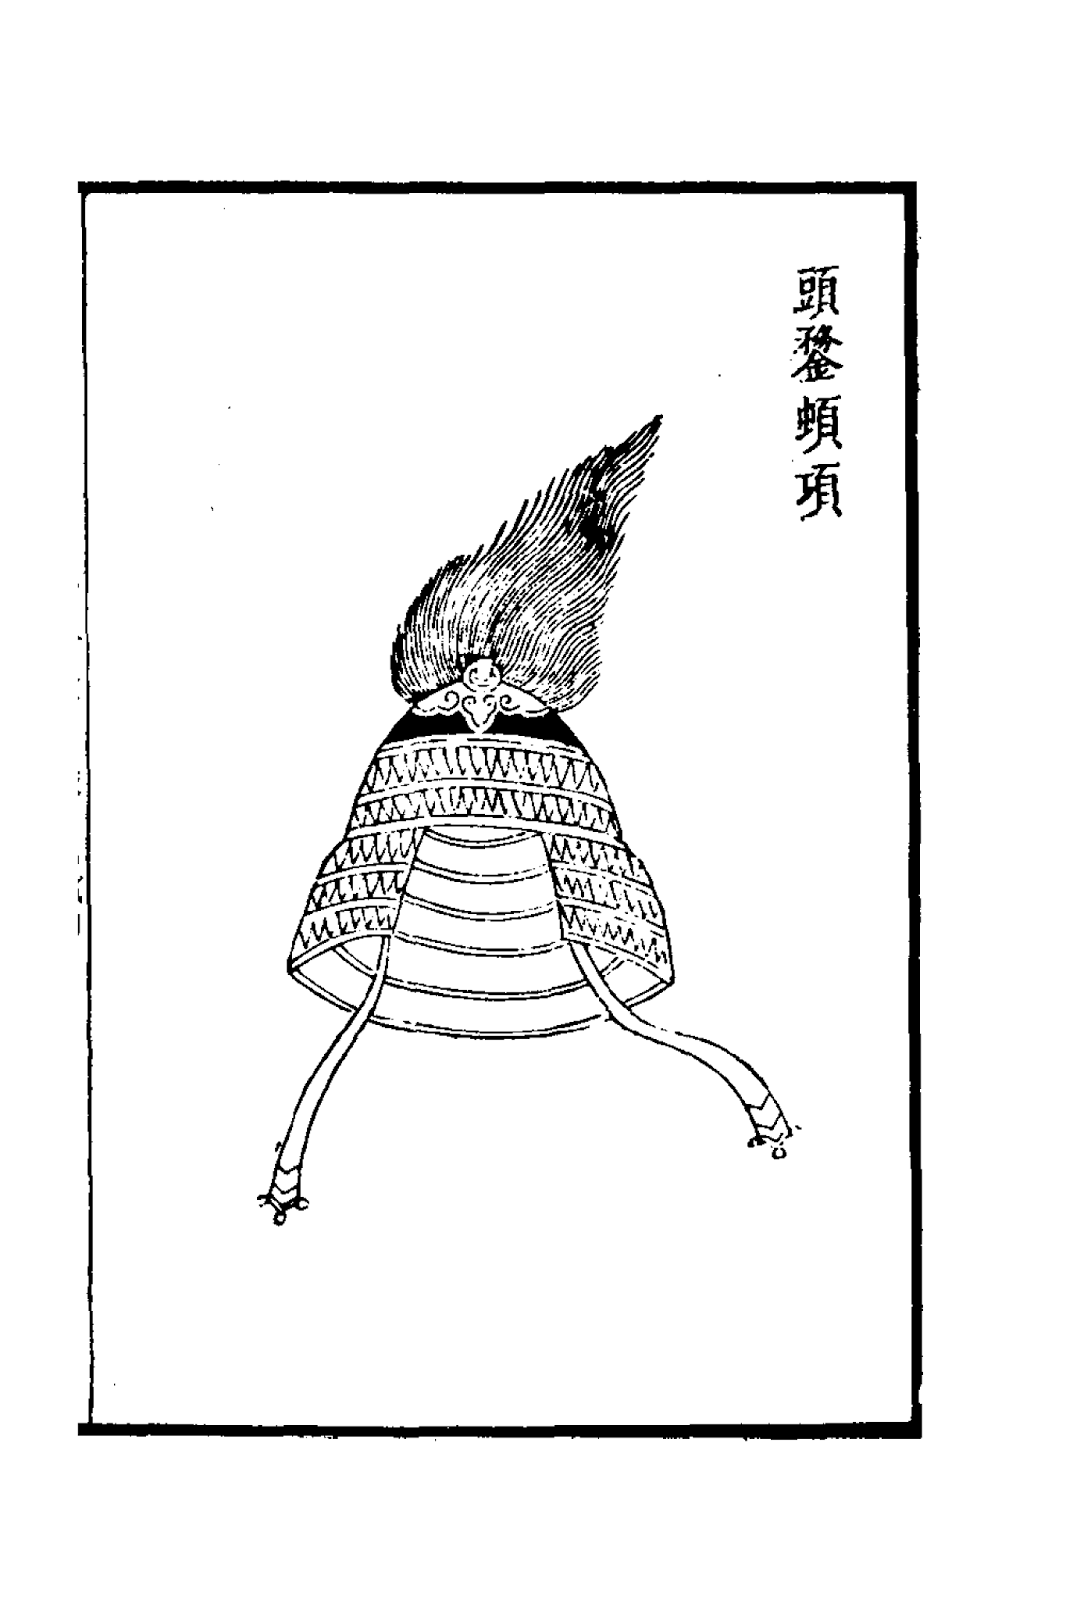 Ming Dynasty Helmet